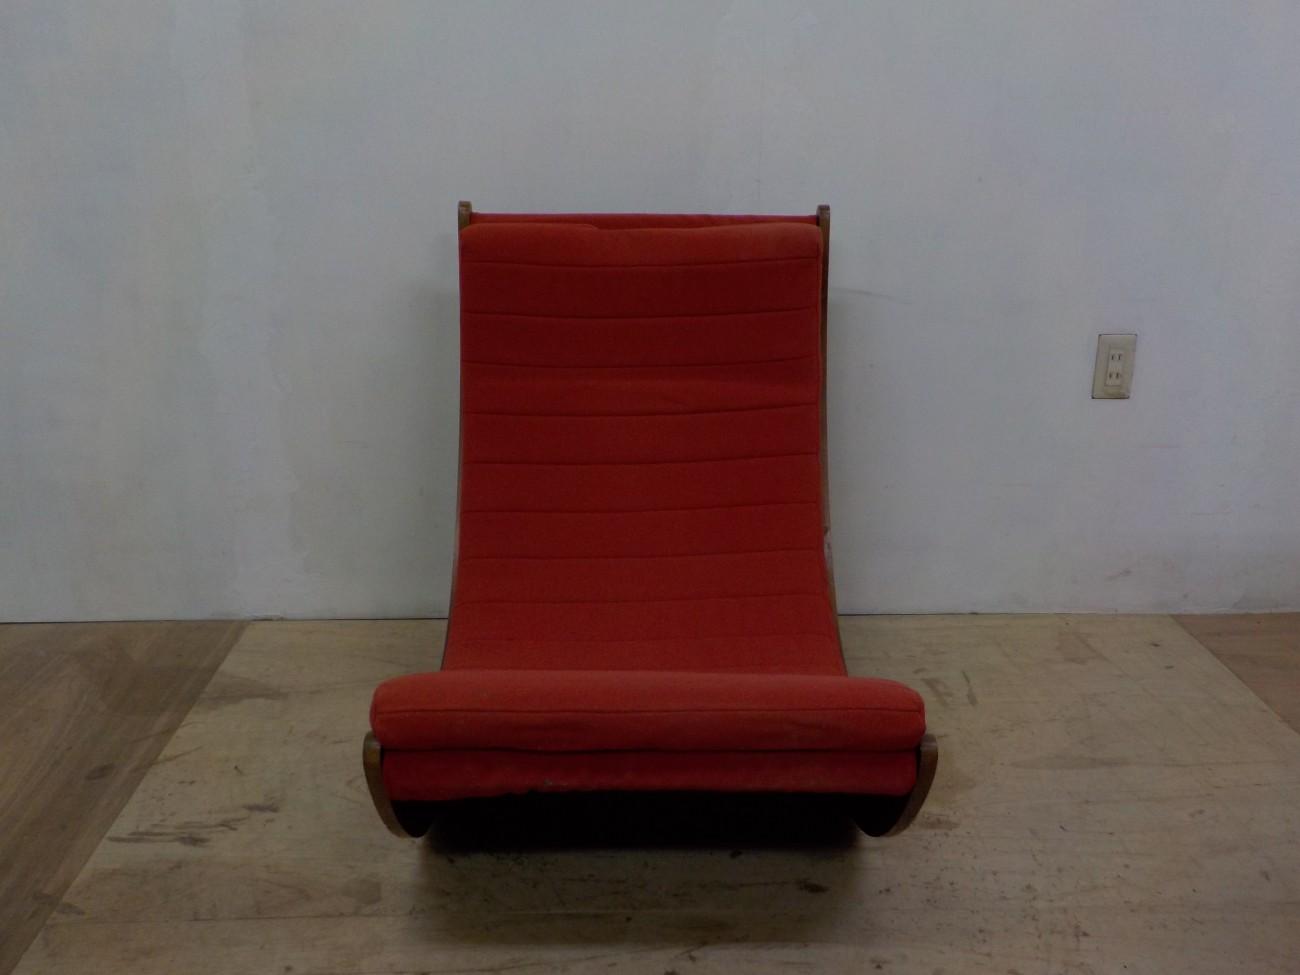 Verner Panton  Rocking chair / オーク ヴェルナー・パントン ロッキングチェア / stock2012-5